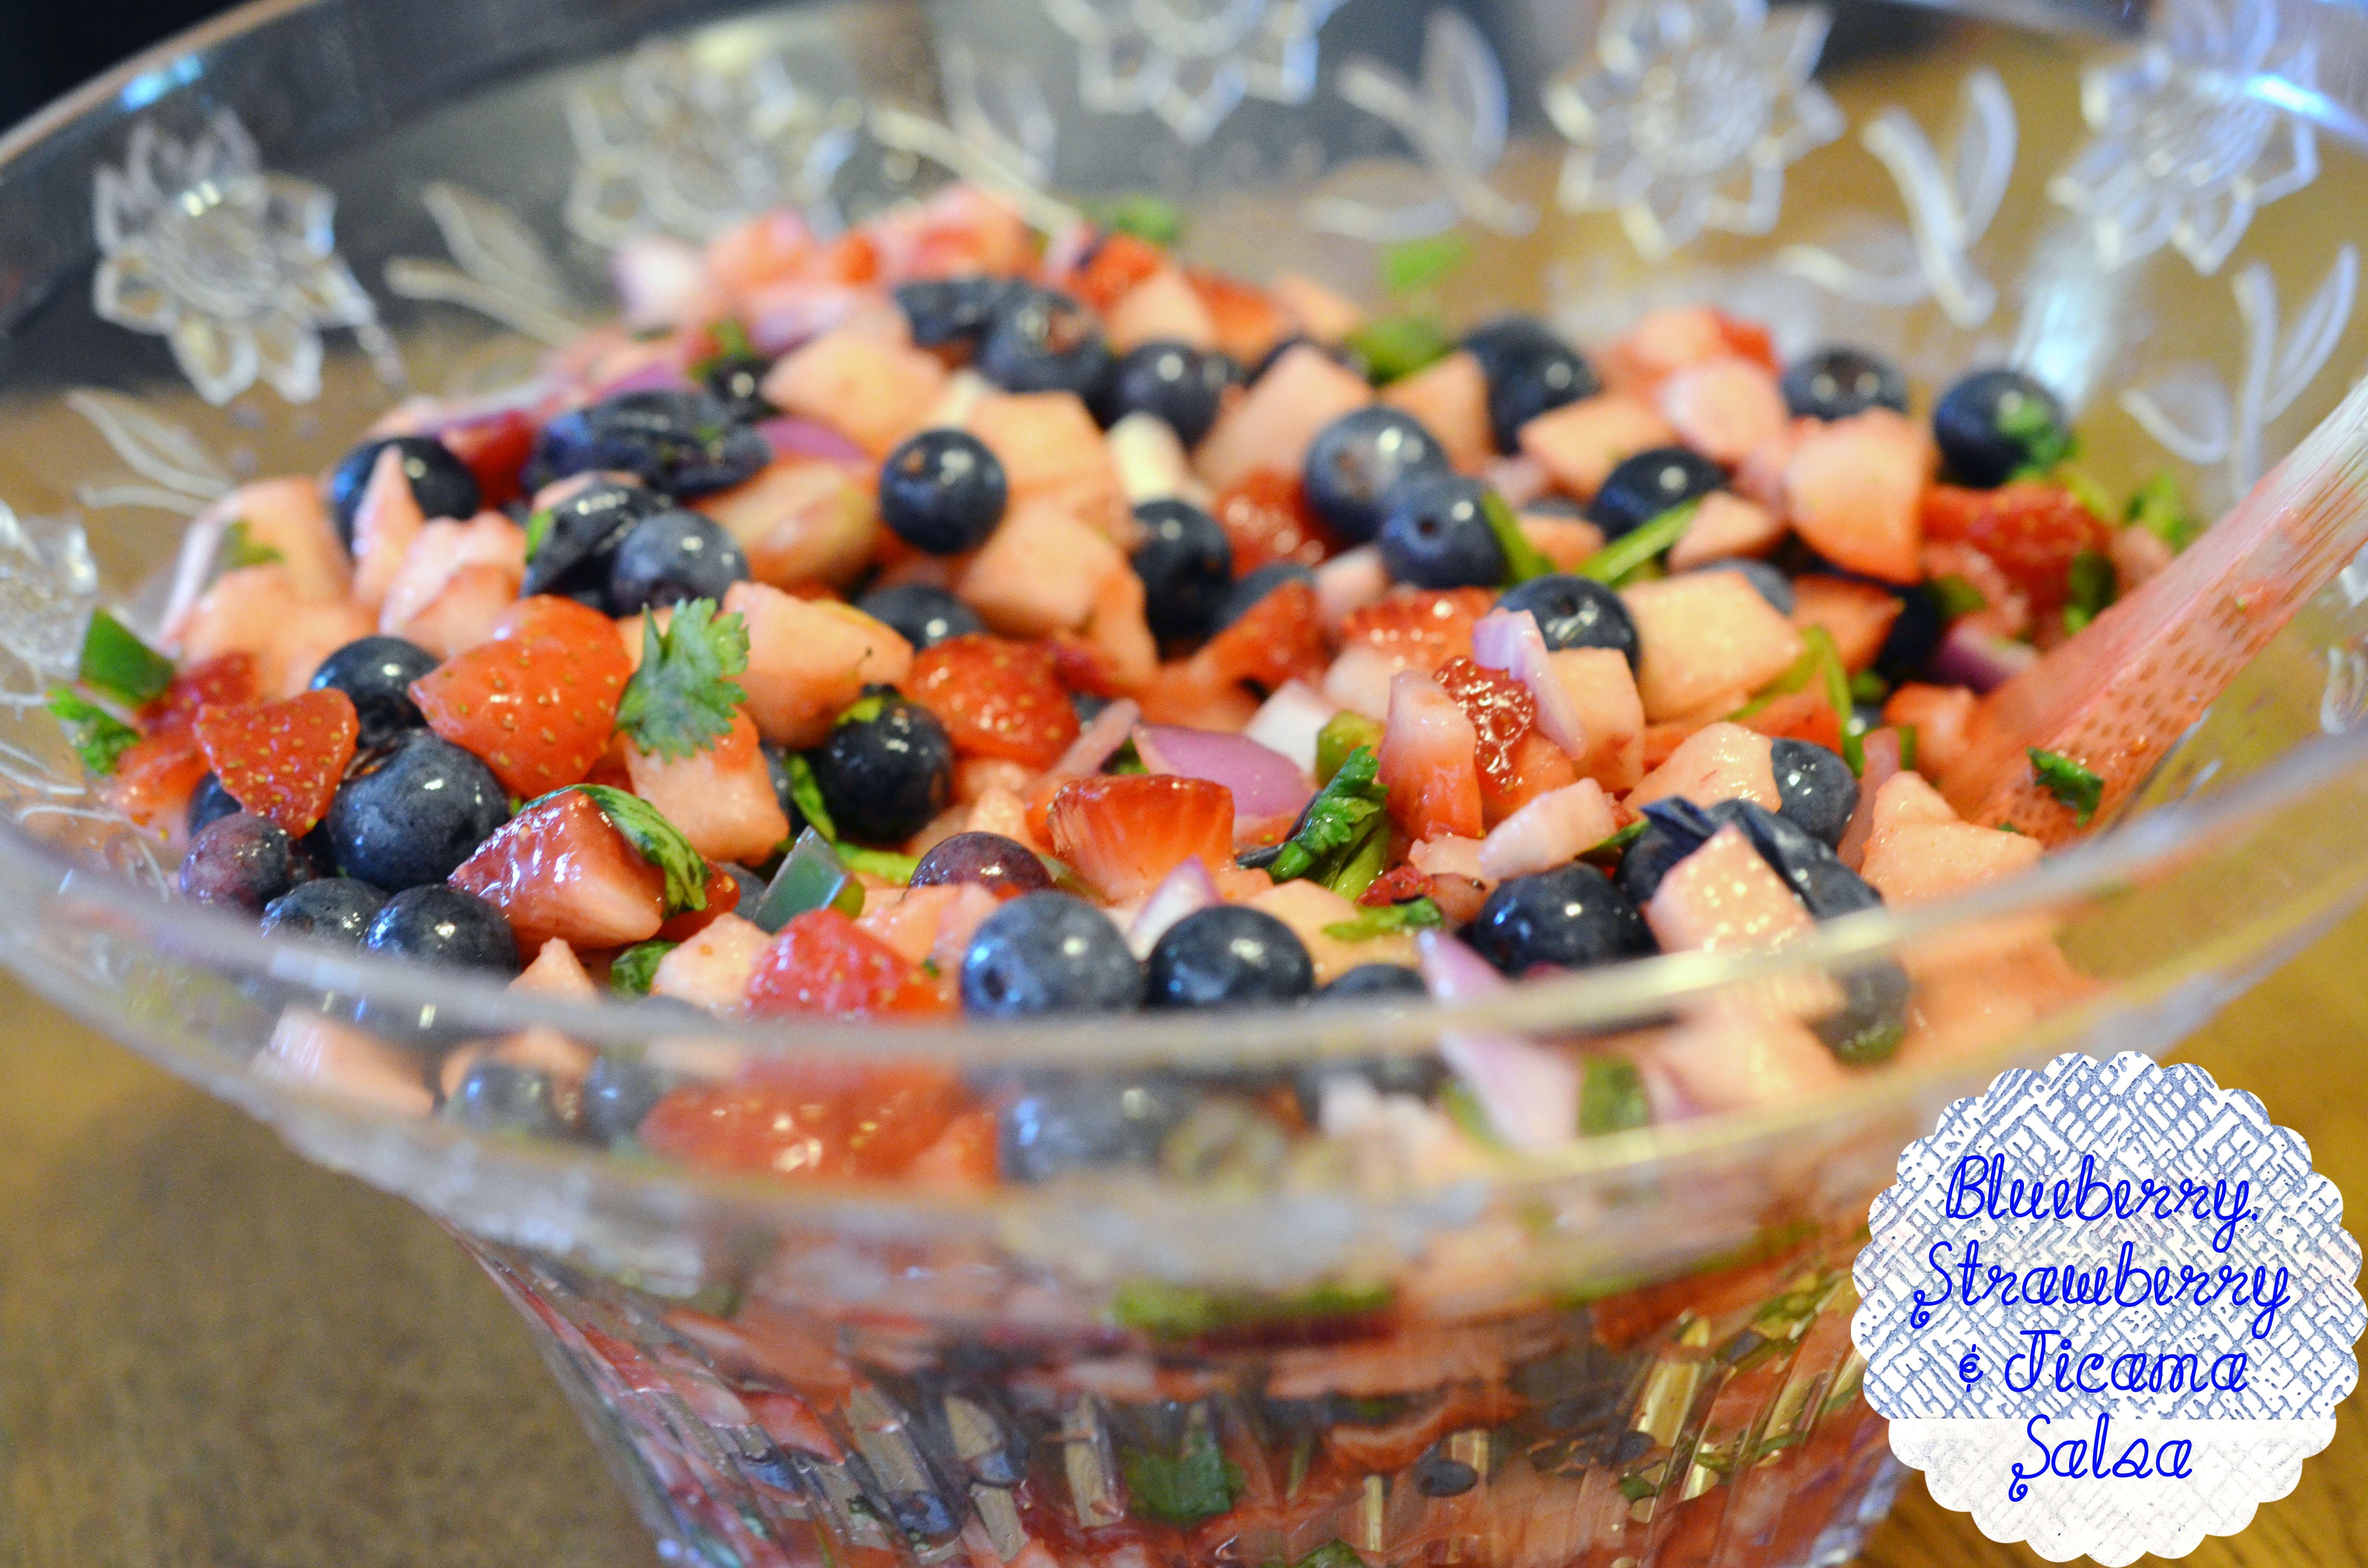 ... salsa strawberry blueberry tart blueberry strawberry jicama salsa